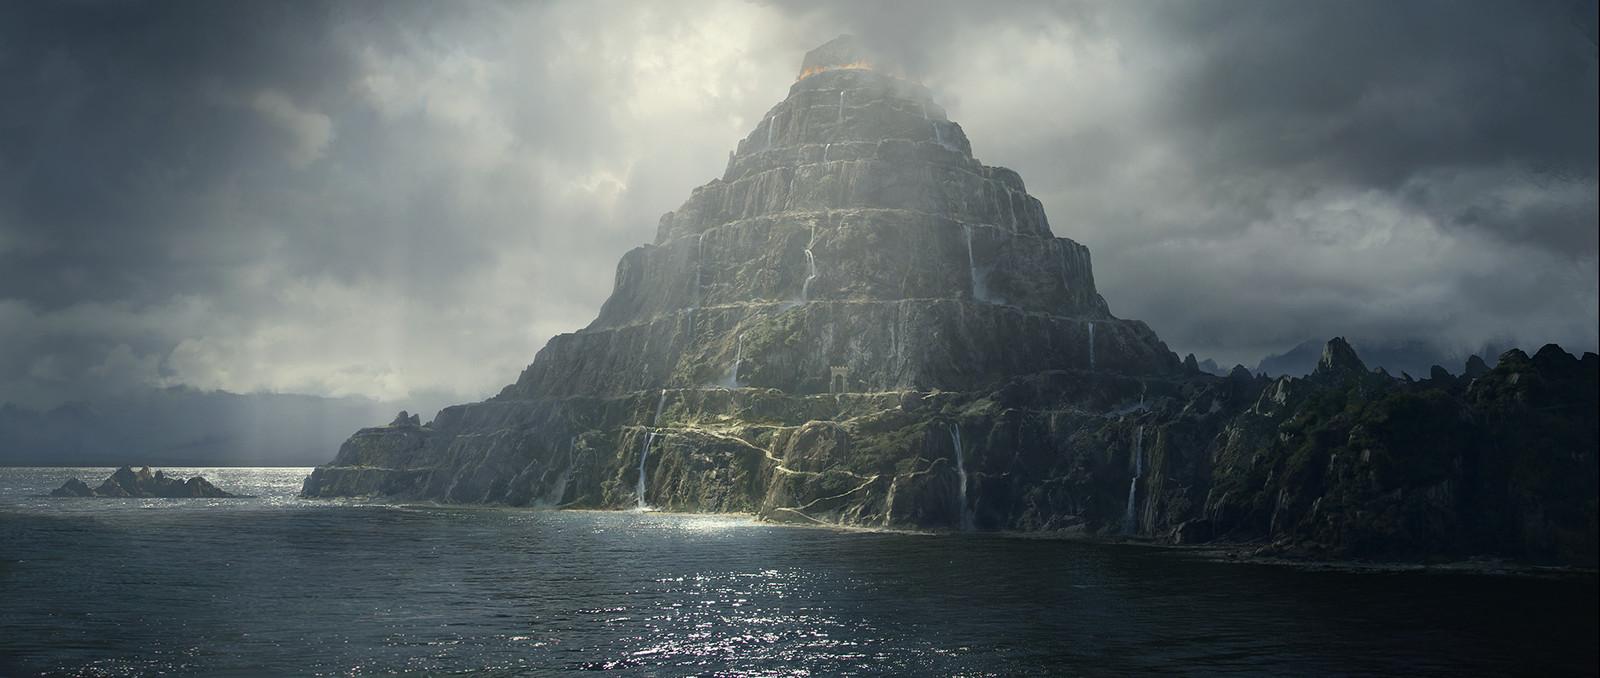 Mt Purgatory, Dantes Inferno